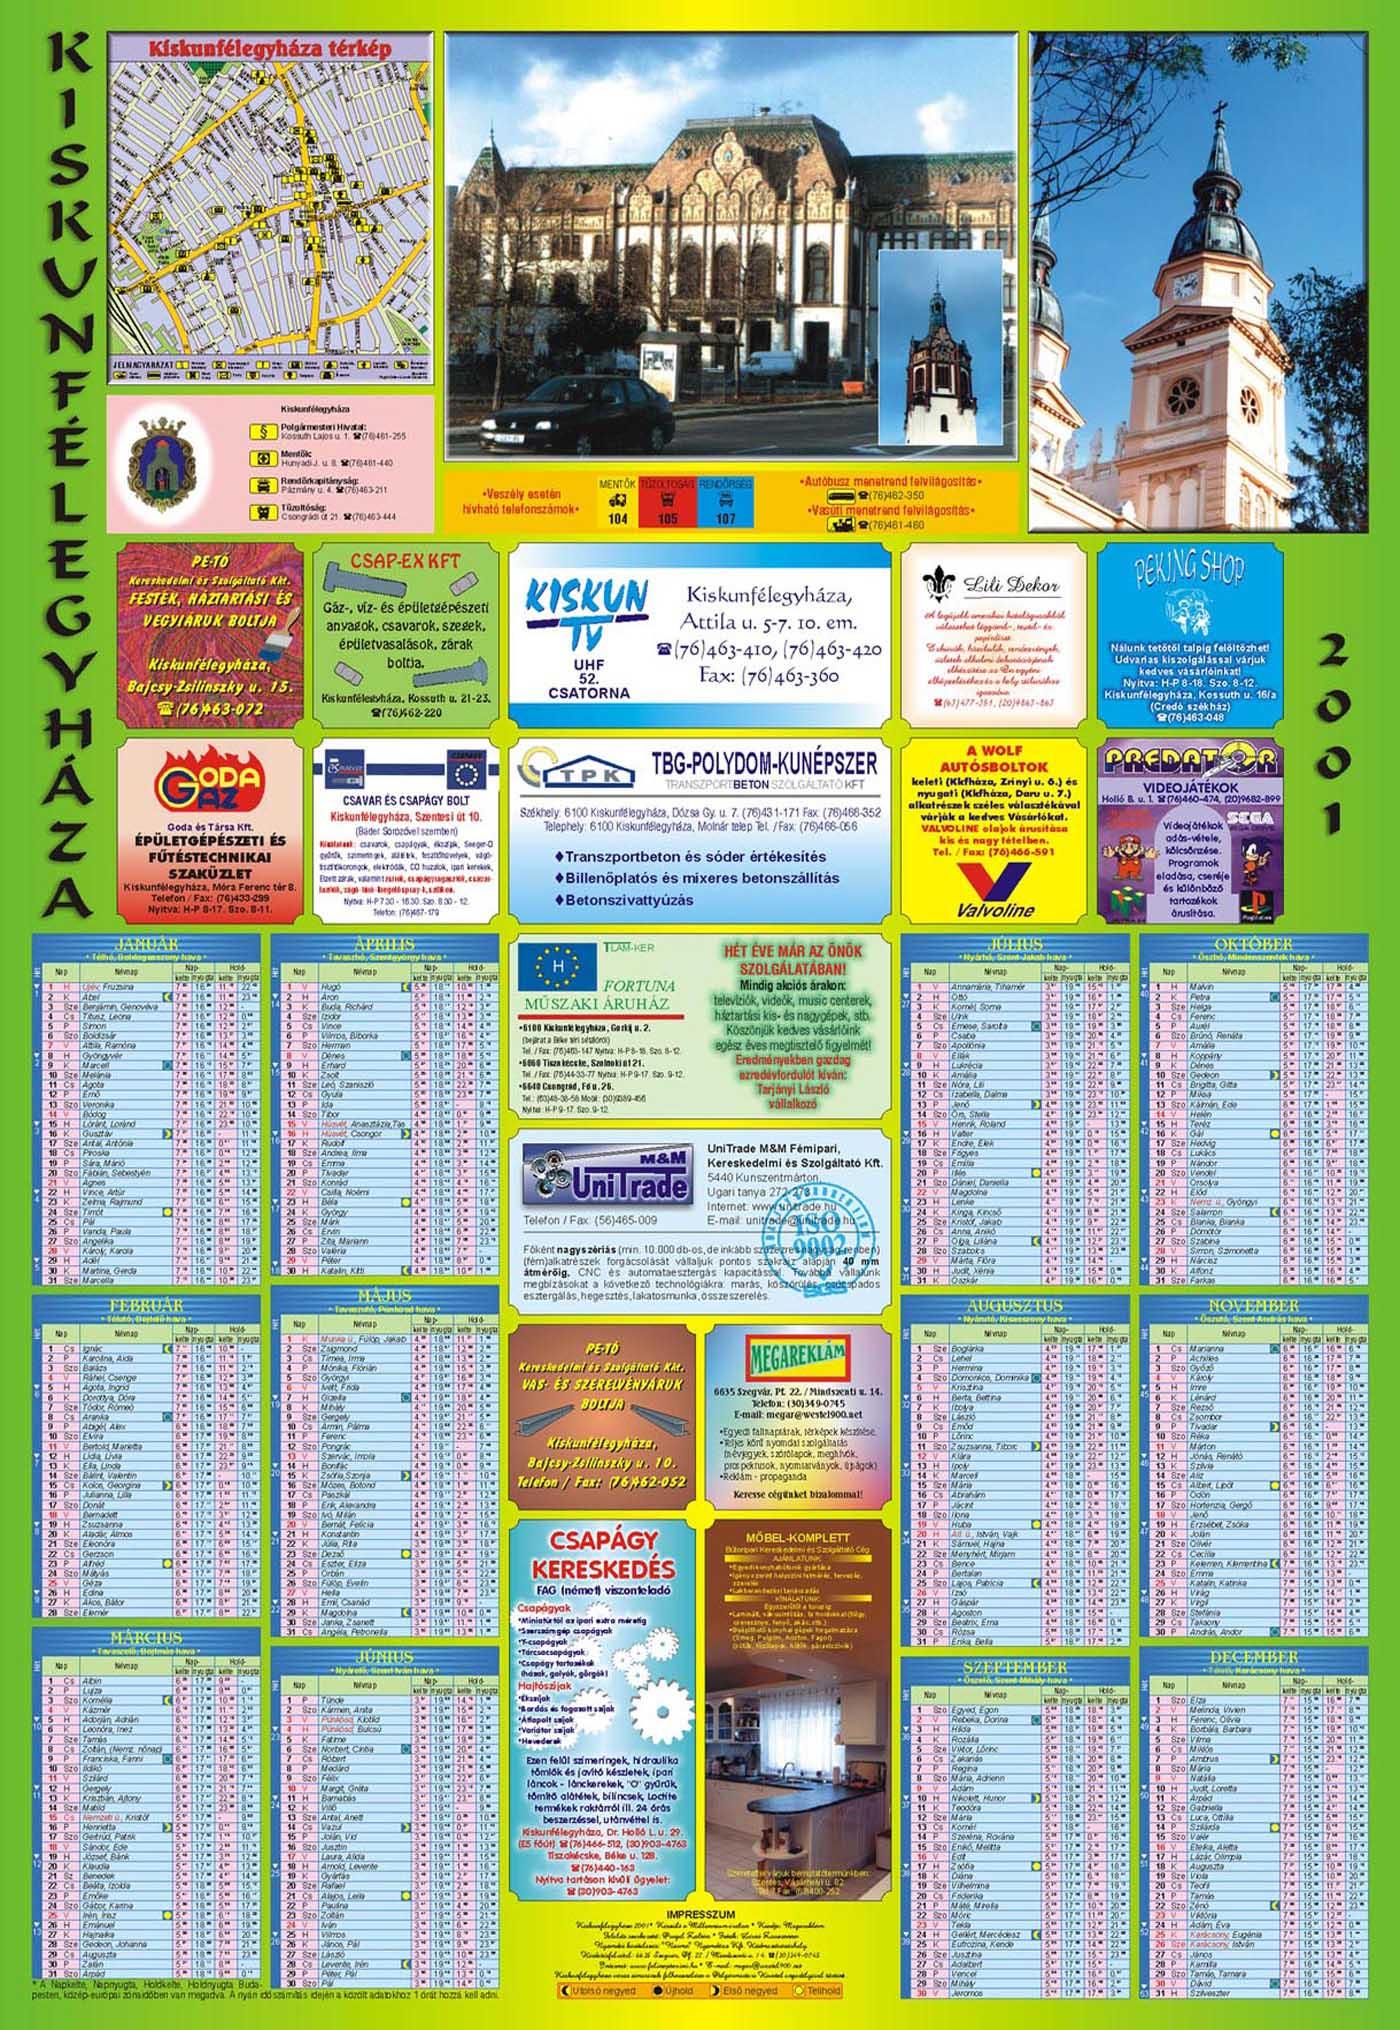 09-Kiskunfelegyhaza2001Falinaptar-2000